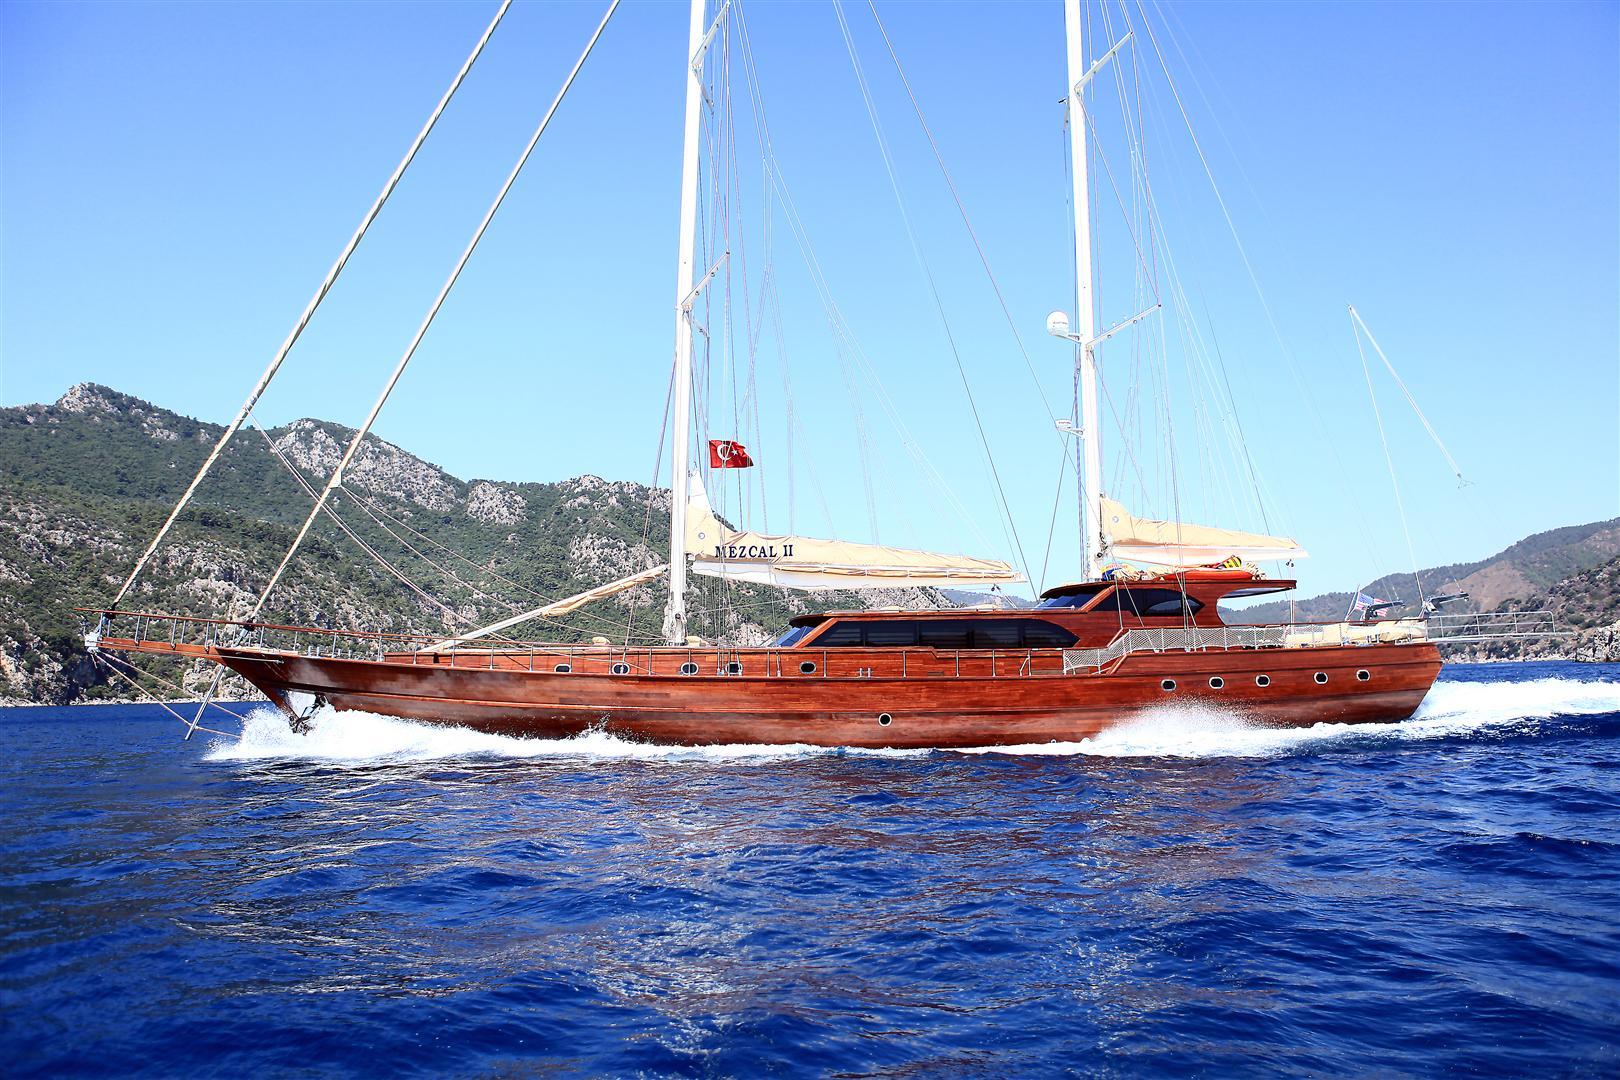 Gulet MEZCAL 2 - Cruising